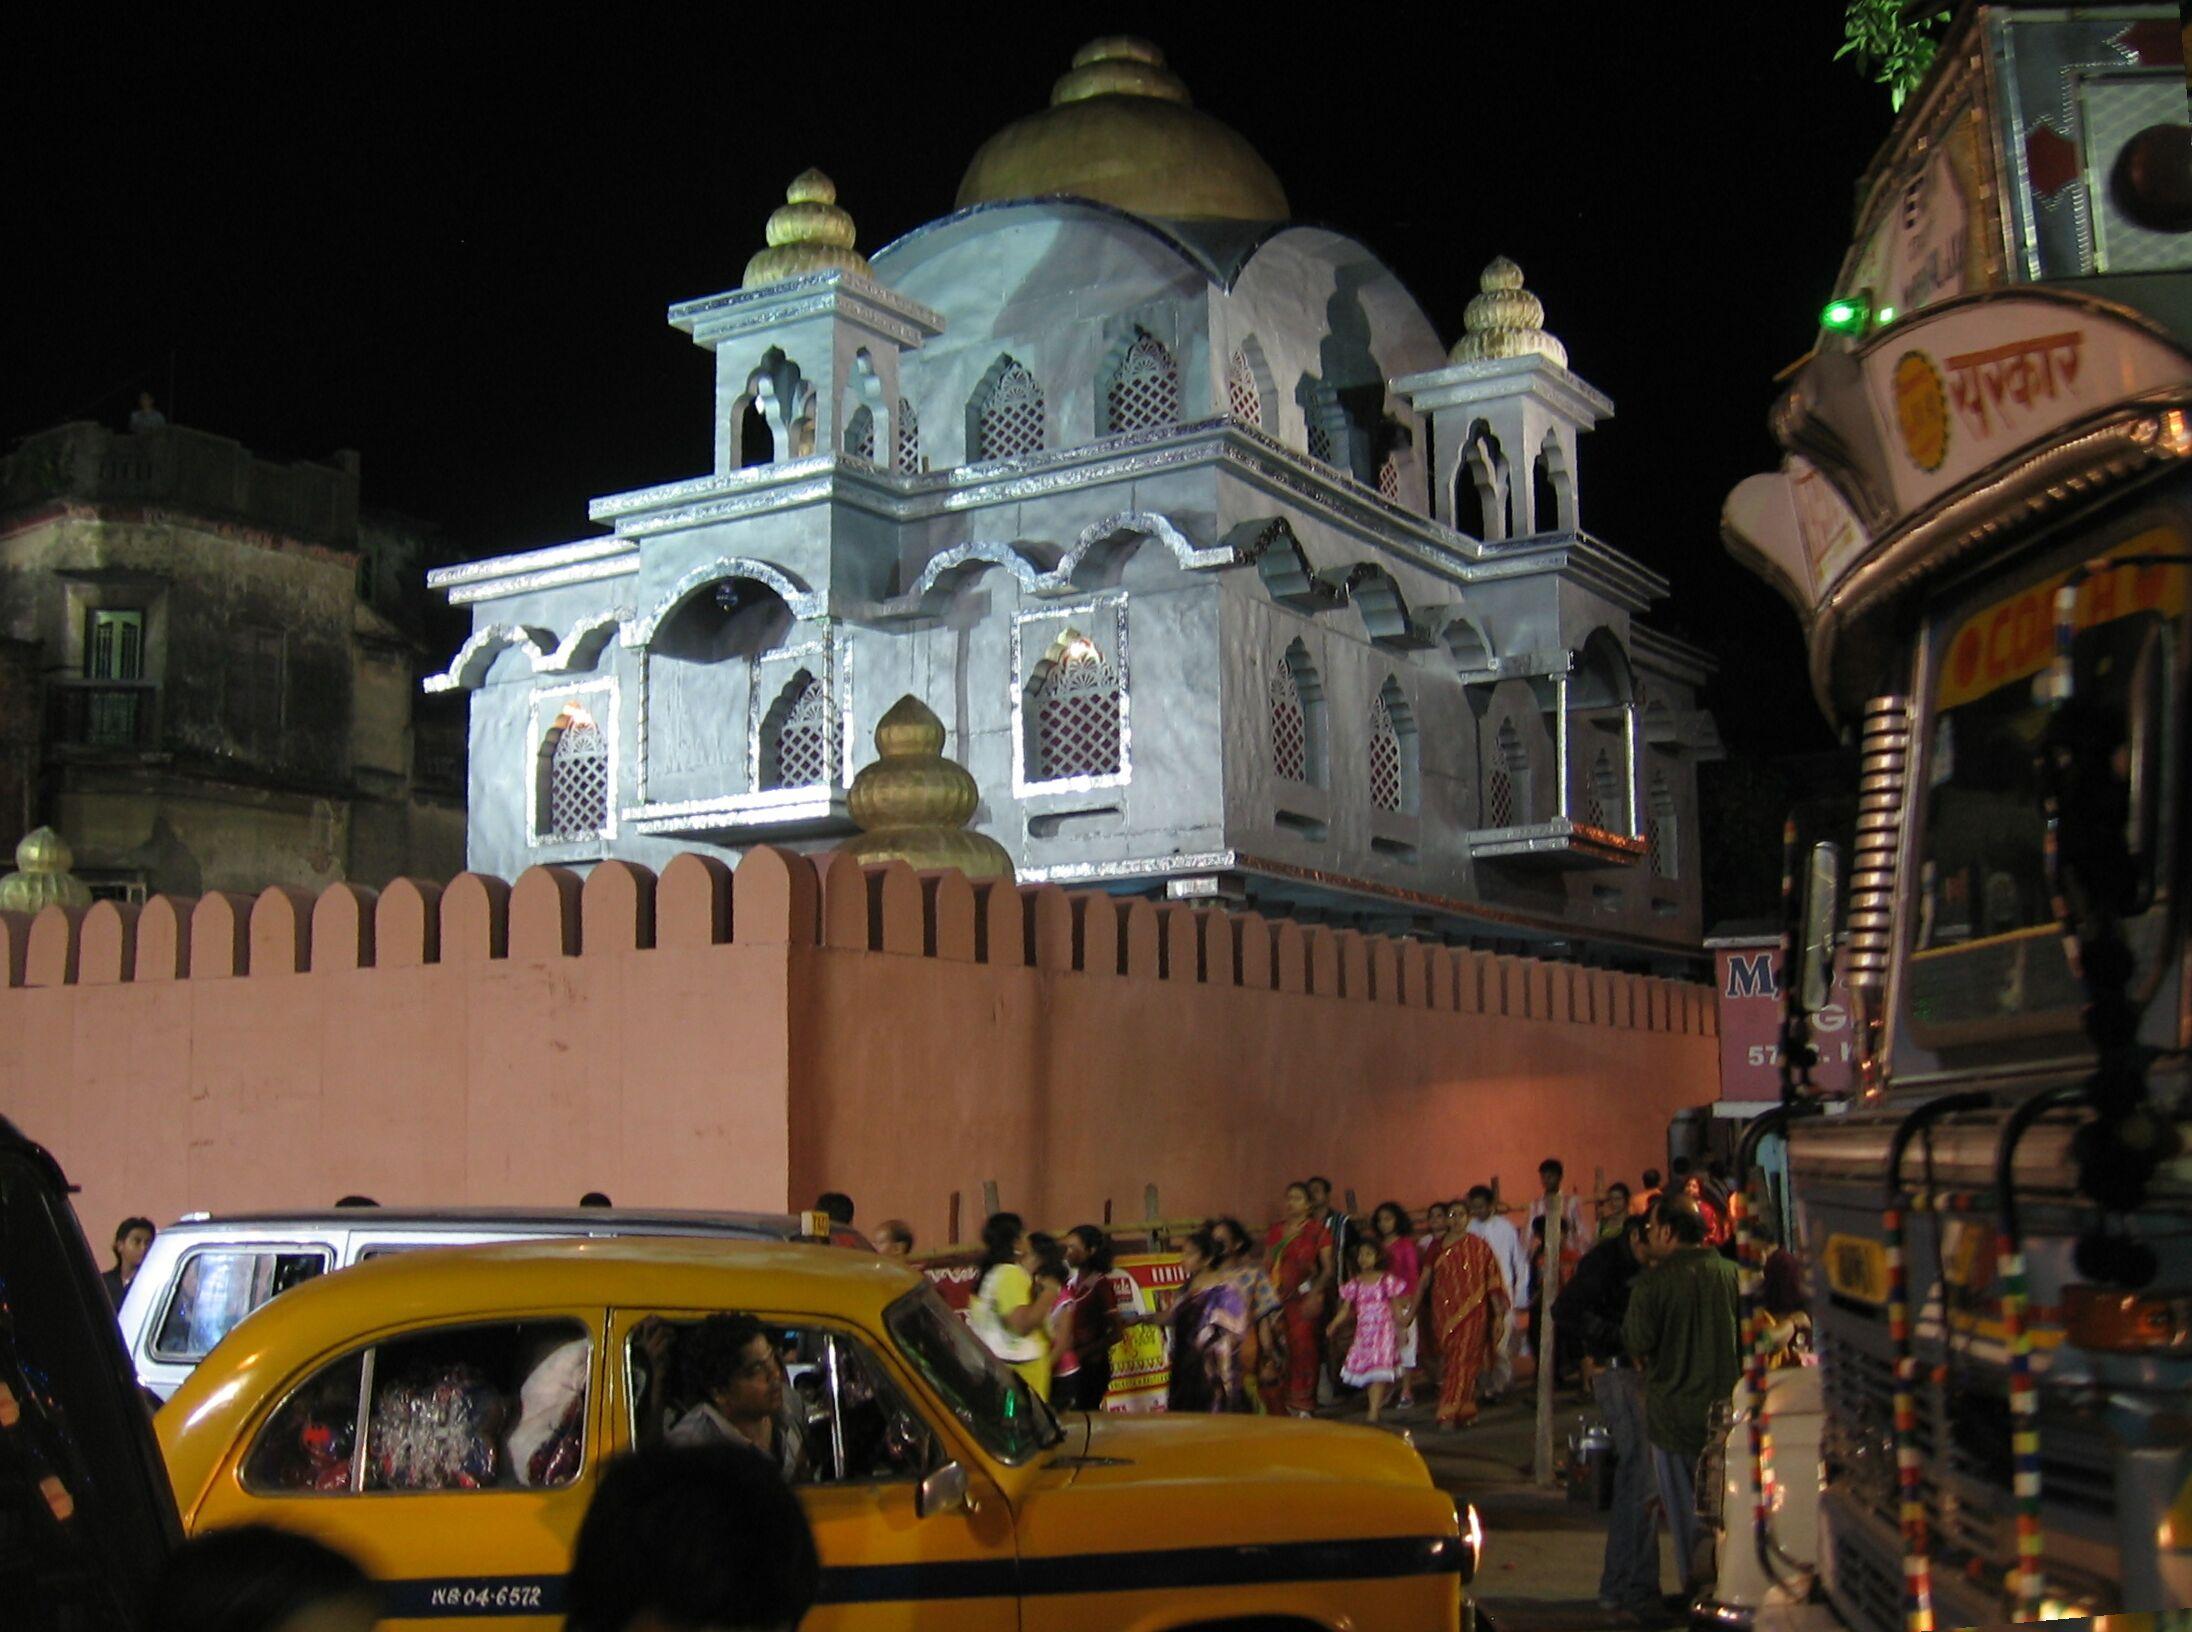 Durga puja sujatas dream durga 5g thecheapjerseys Image collections